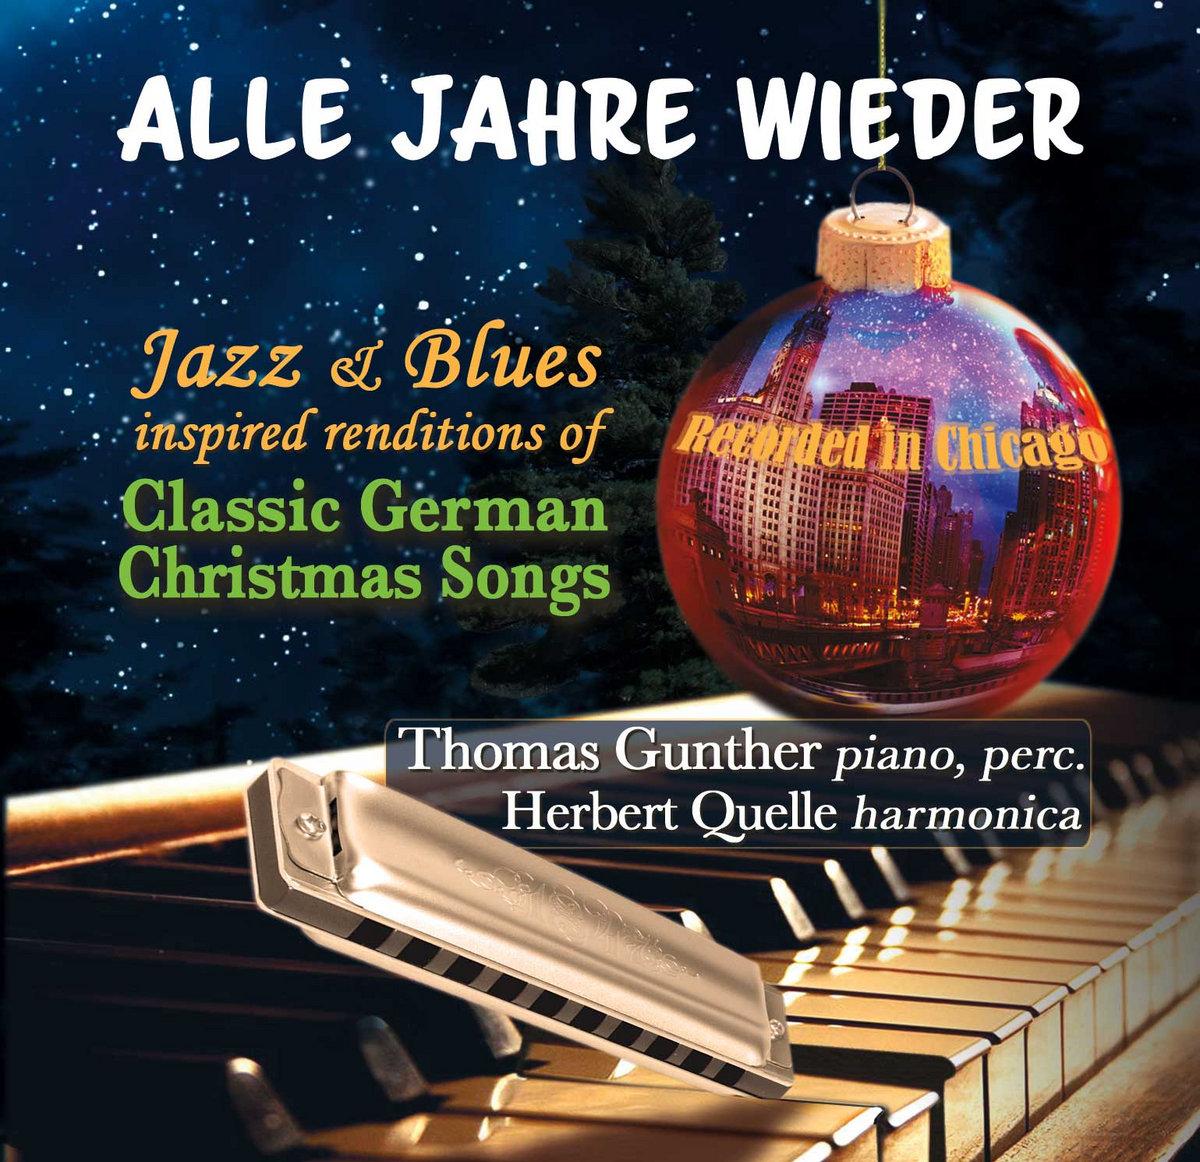 classic german christmas songs demo - Blues Christmas Songs